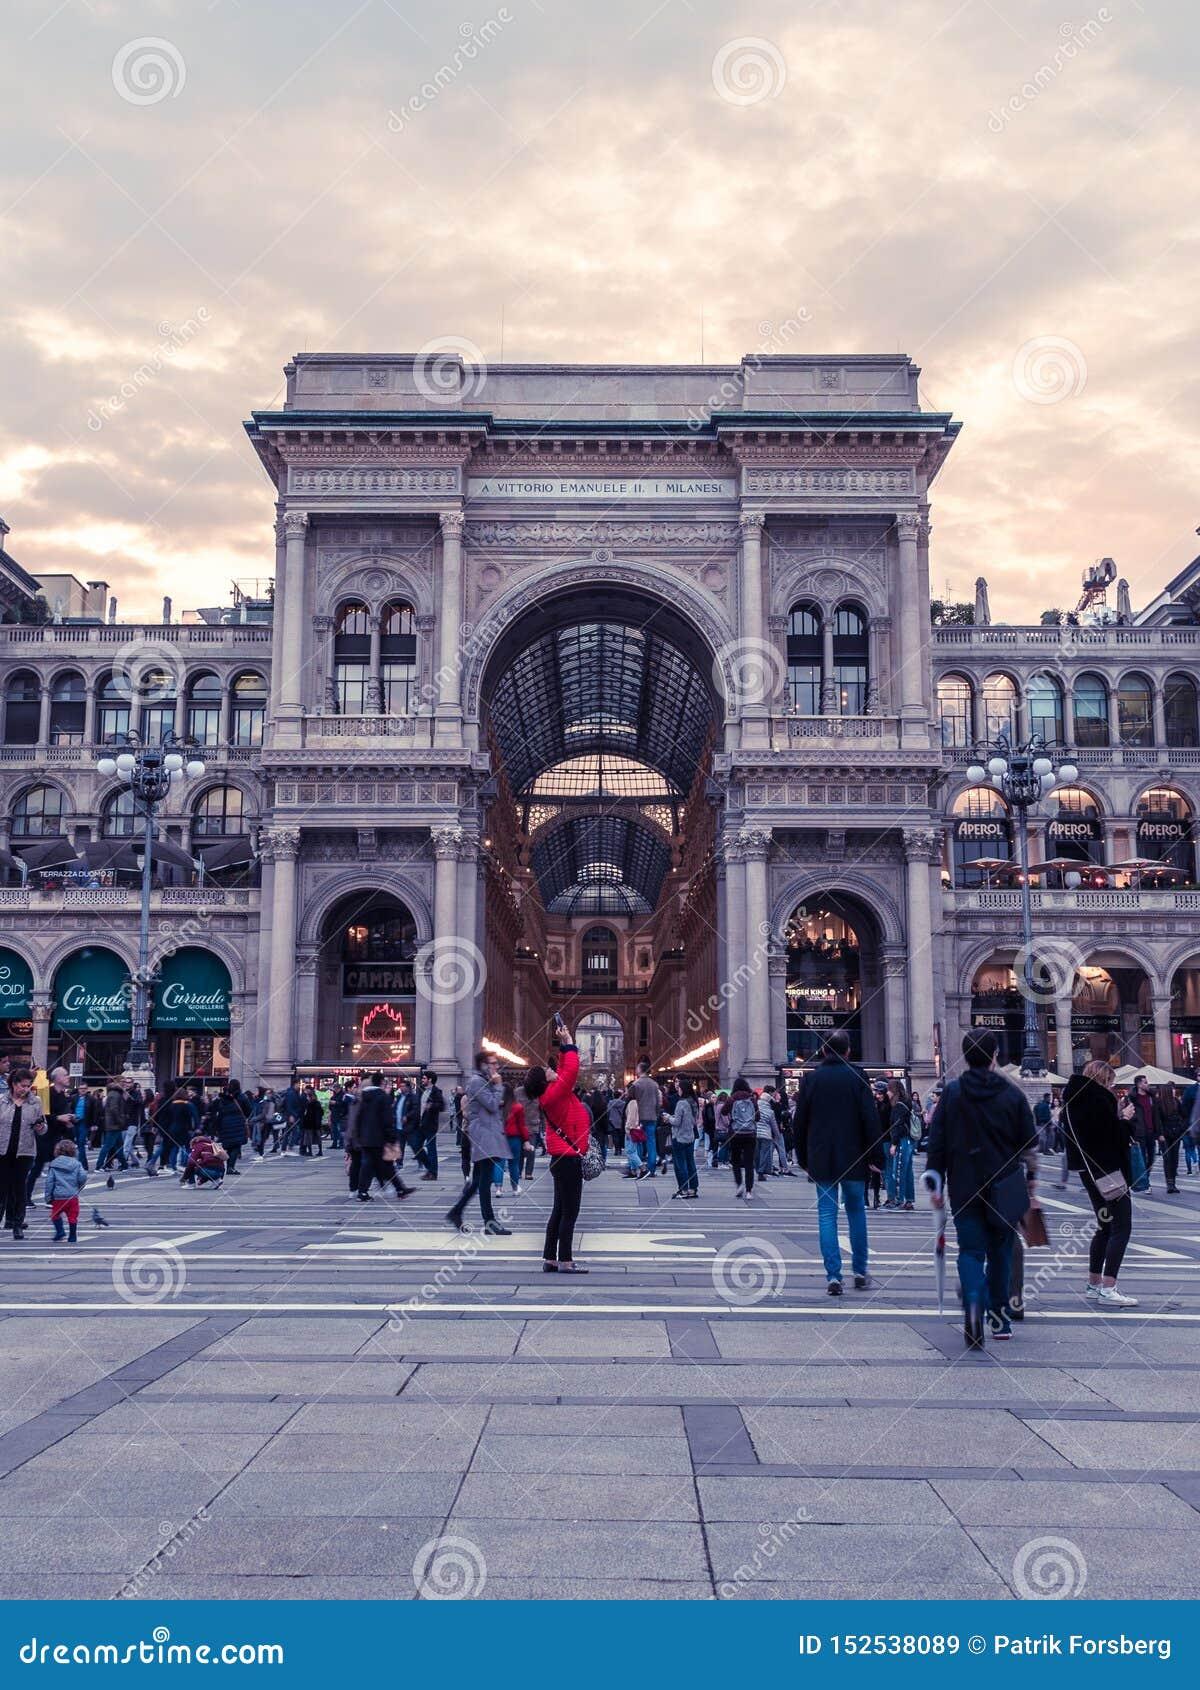 Touristen am Galleria Vittorio, Mailand, Italien